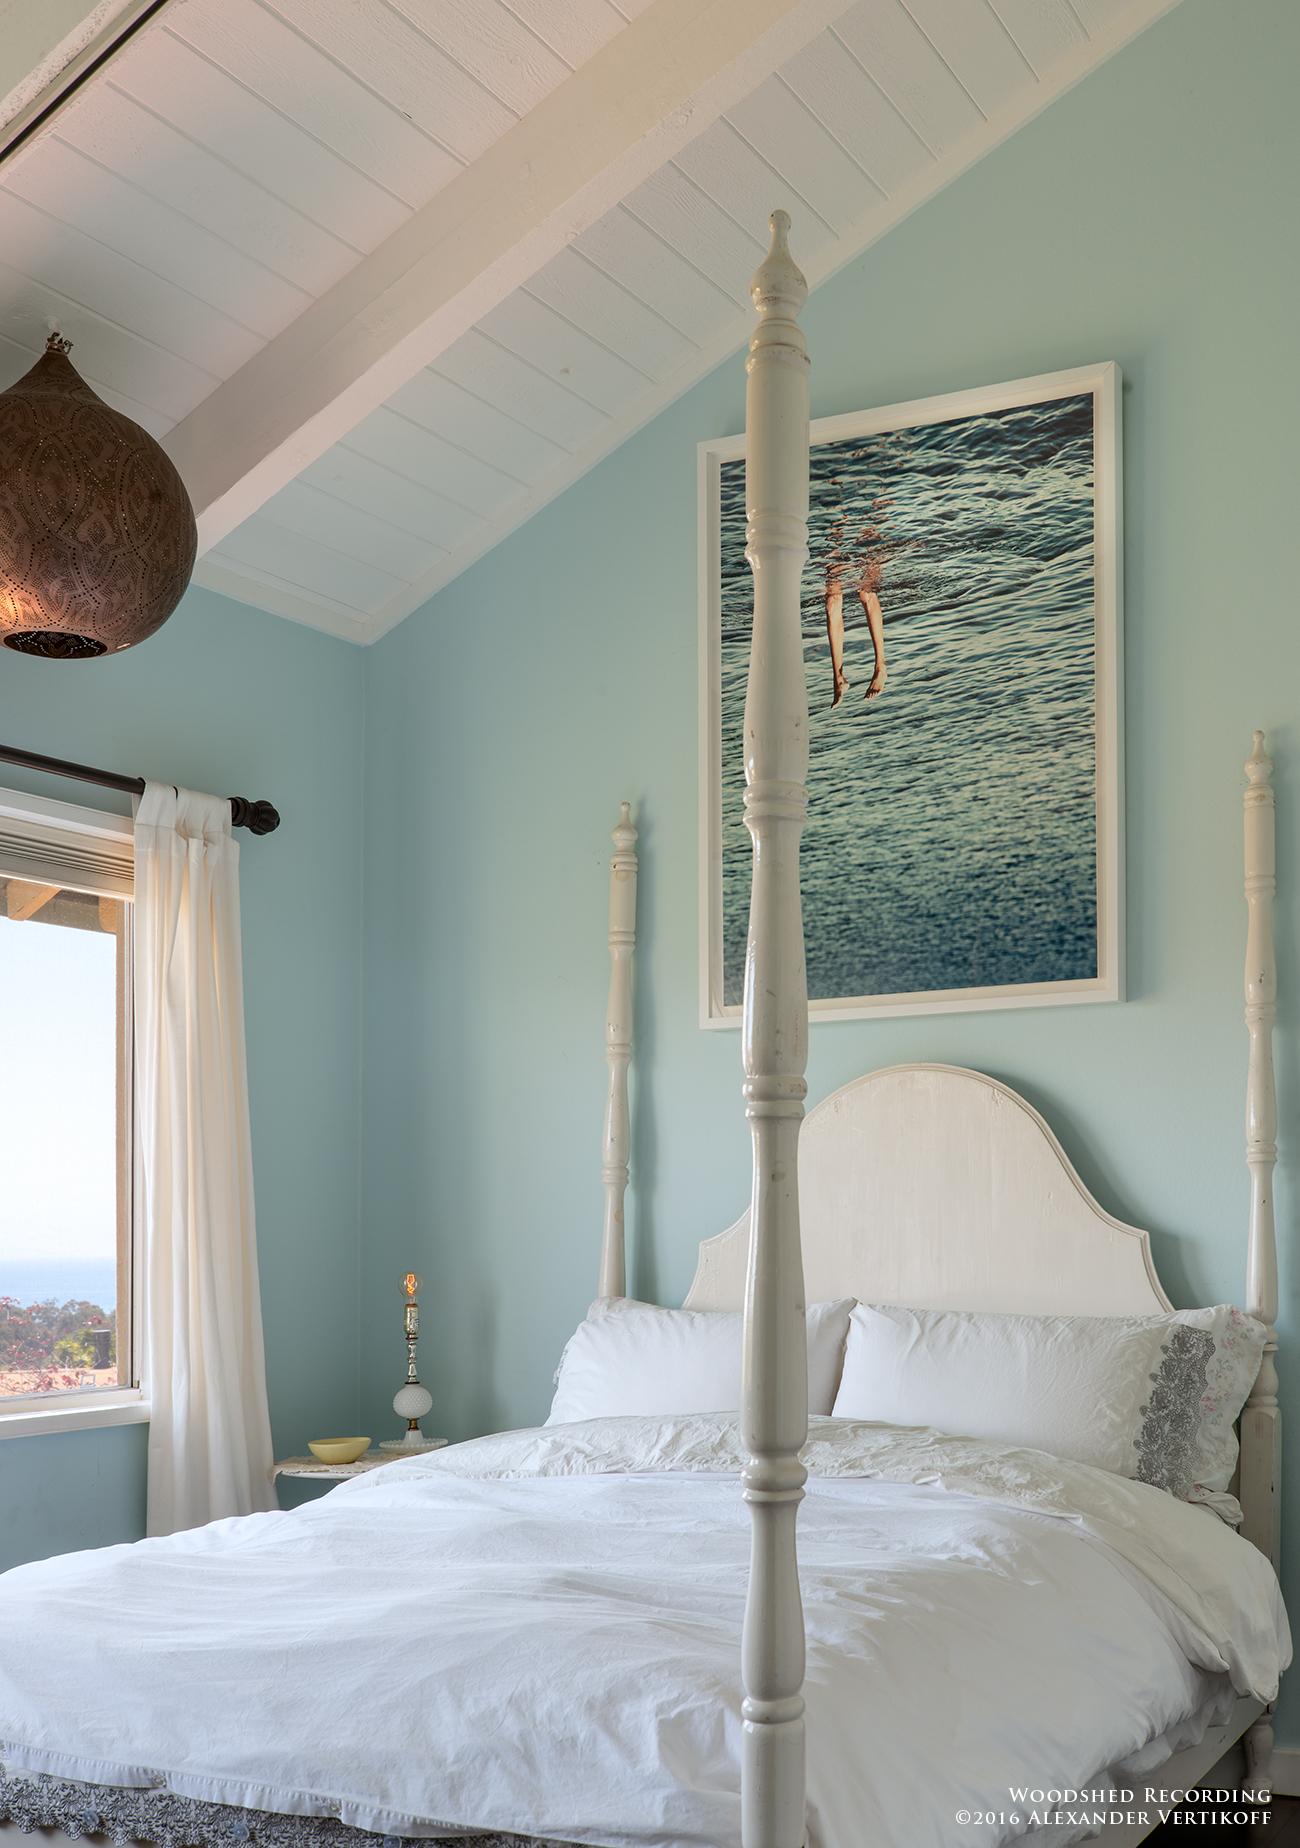 studio-malibu-woodshed-recording-studio-best-recording-studio-malibu-bedroom.jpg